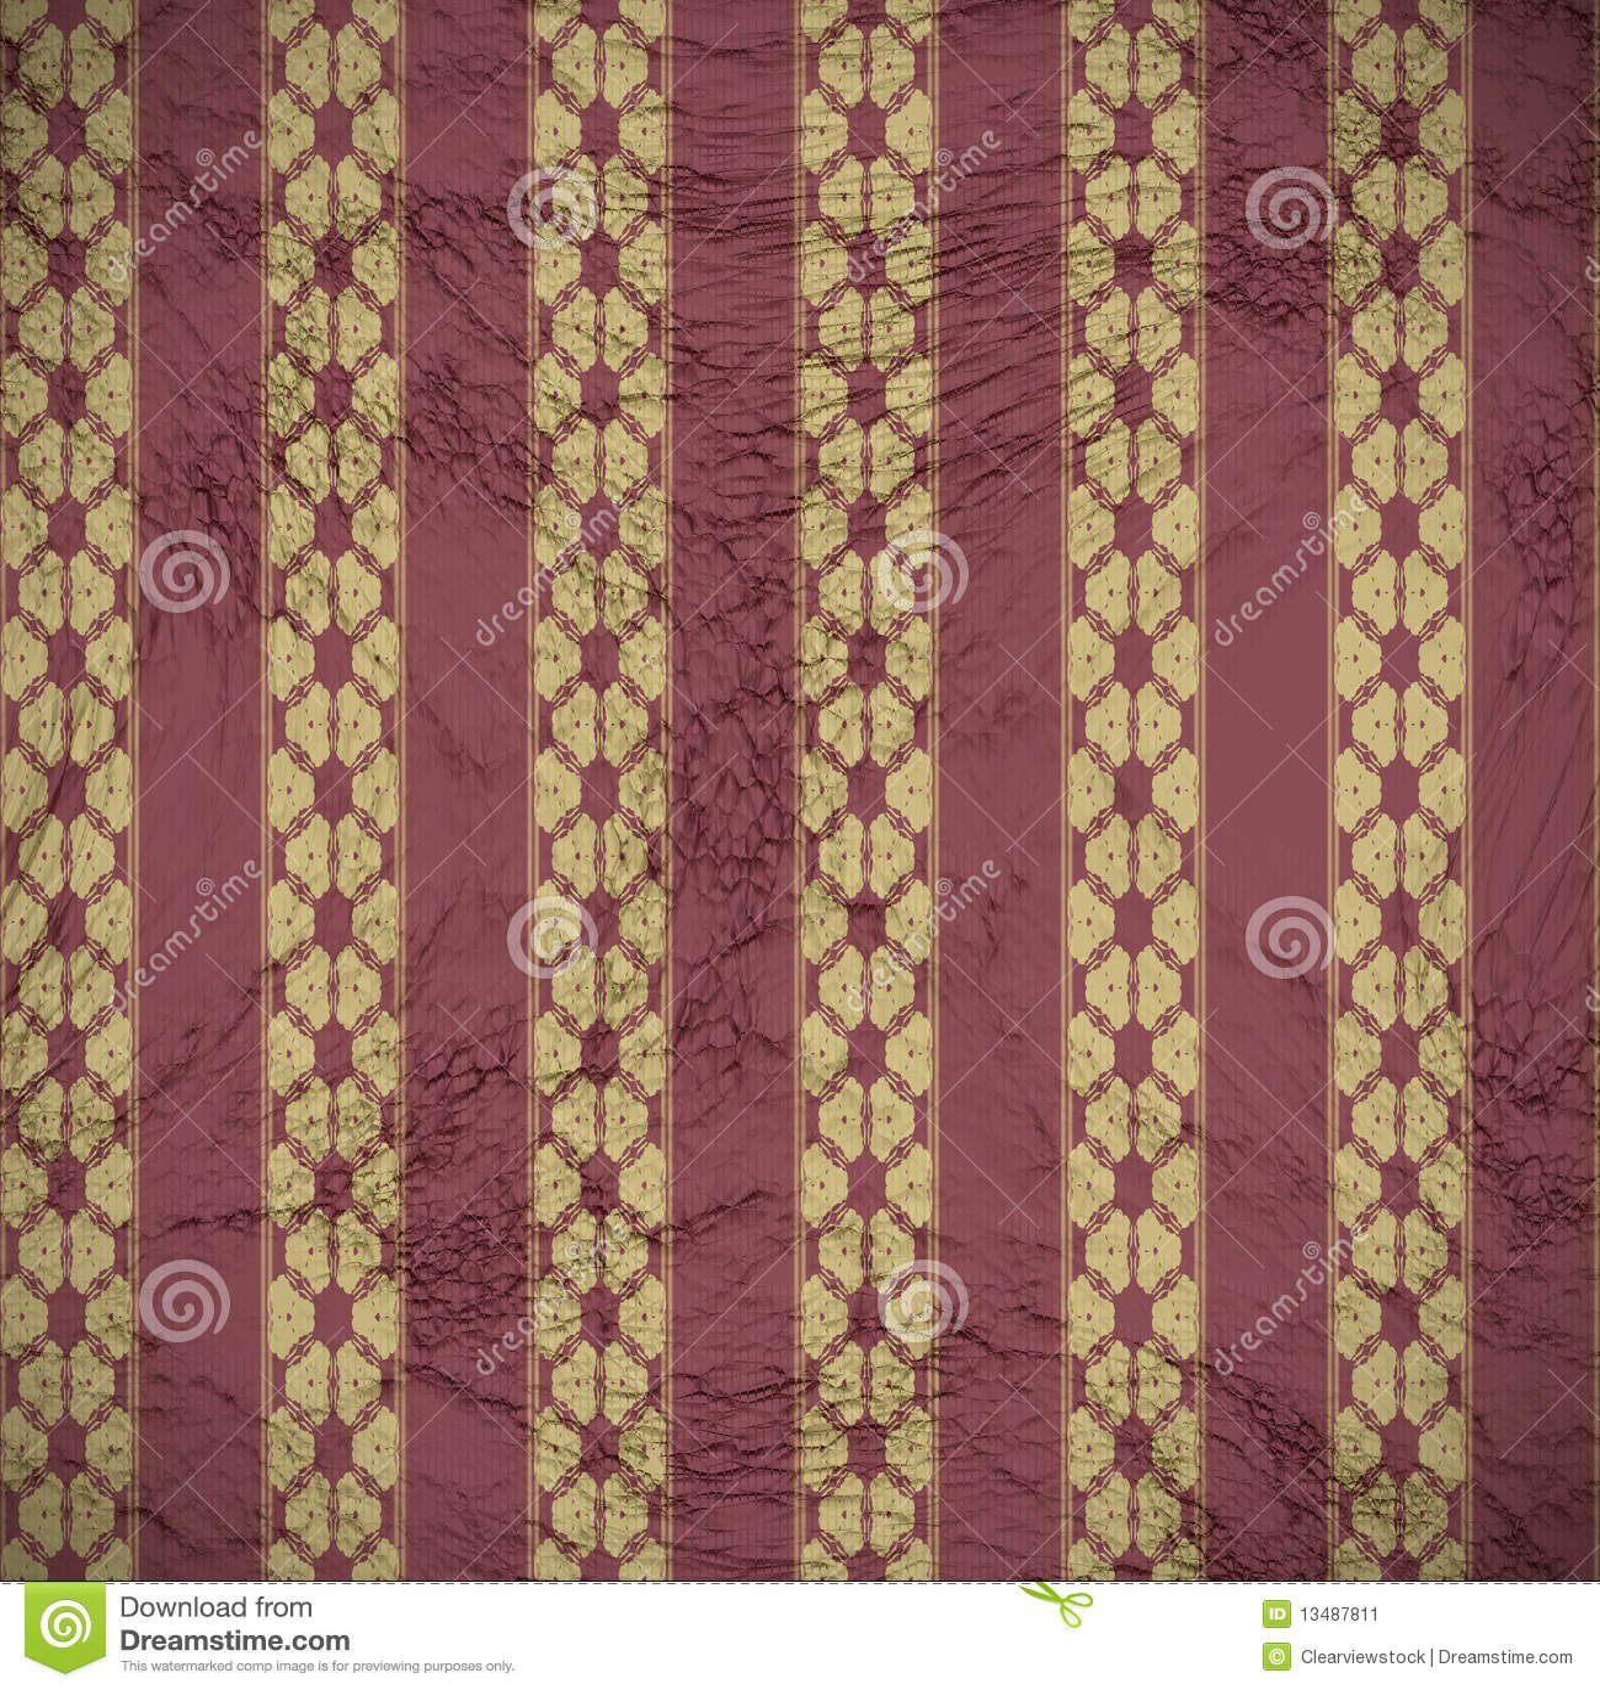 alte tapete auf der wand stockbild bild 13487811. Black Bedroom Furniture Sets. Home Design Ideas